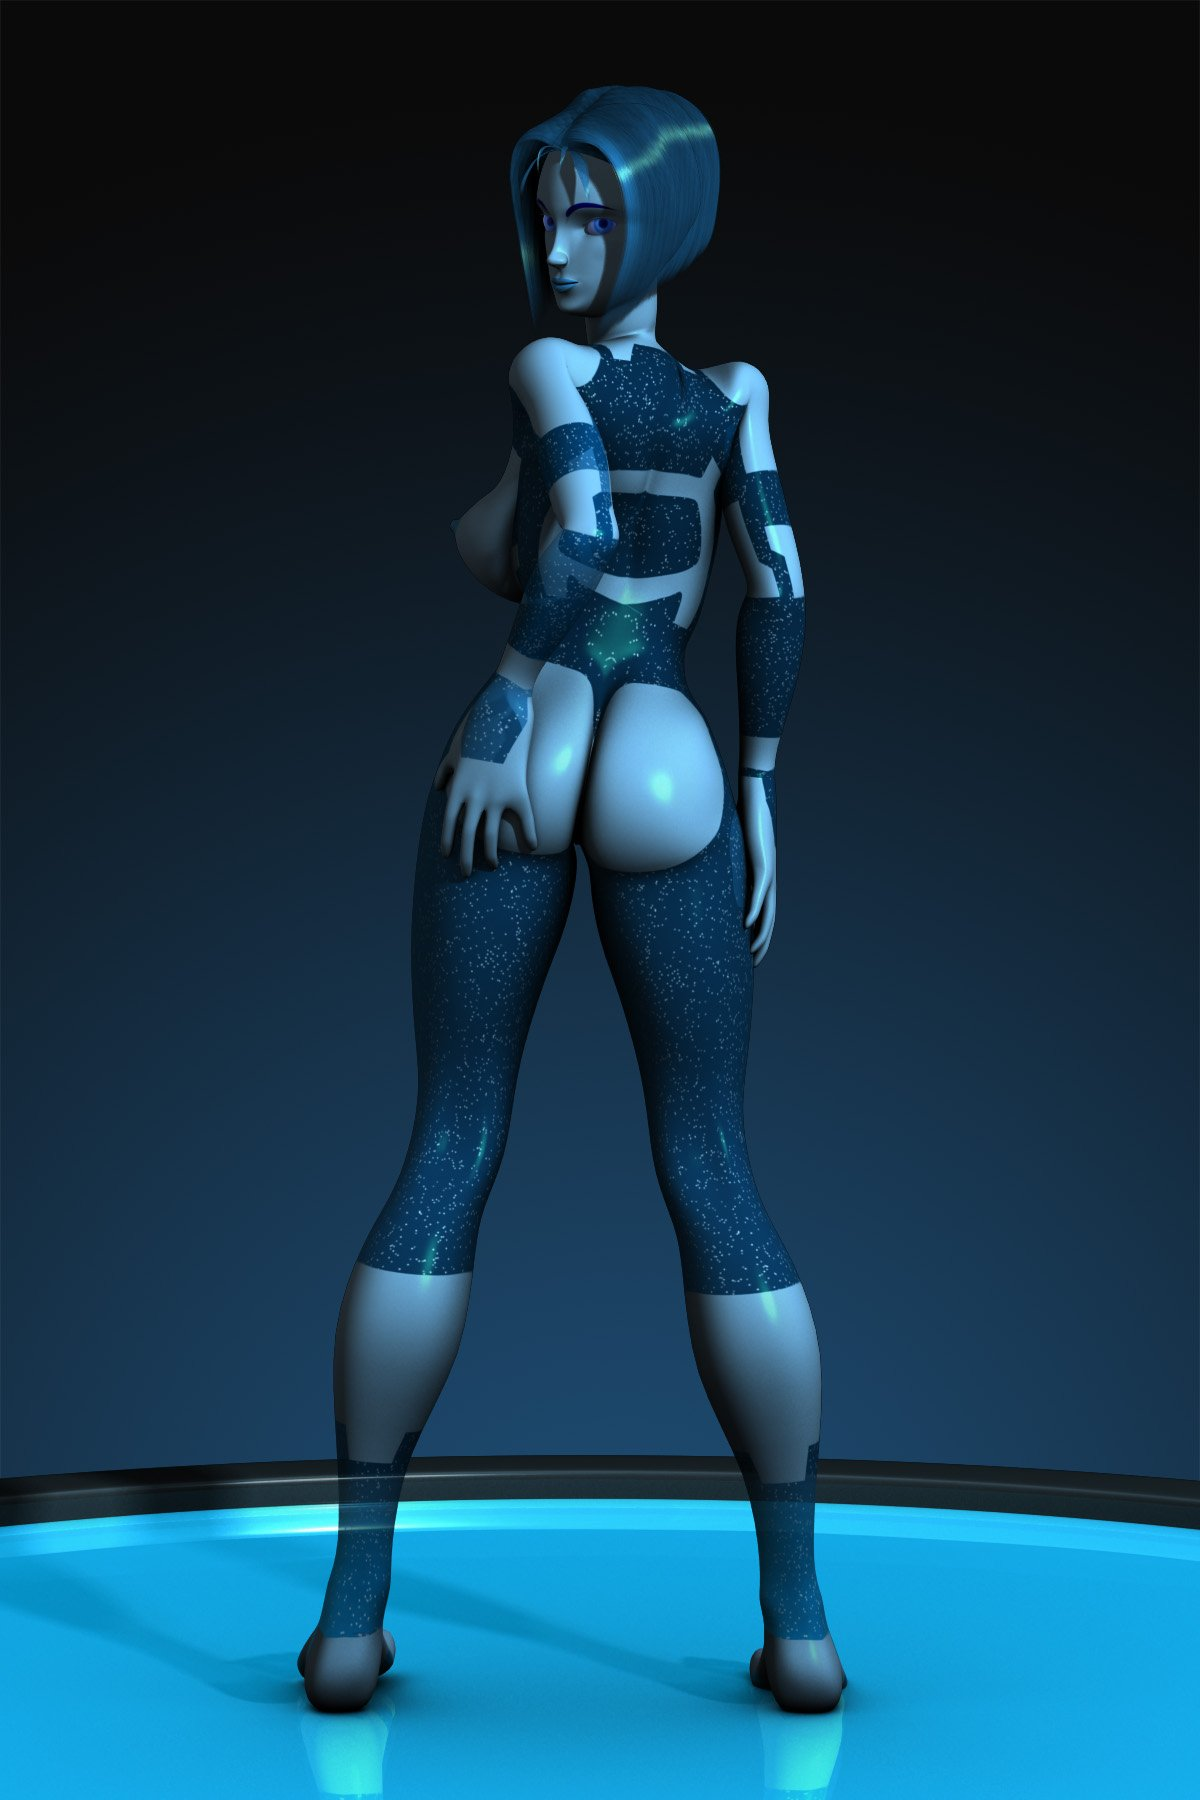 butt halo naked off Cortana